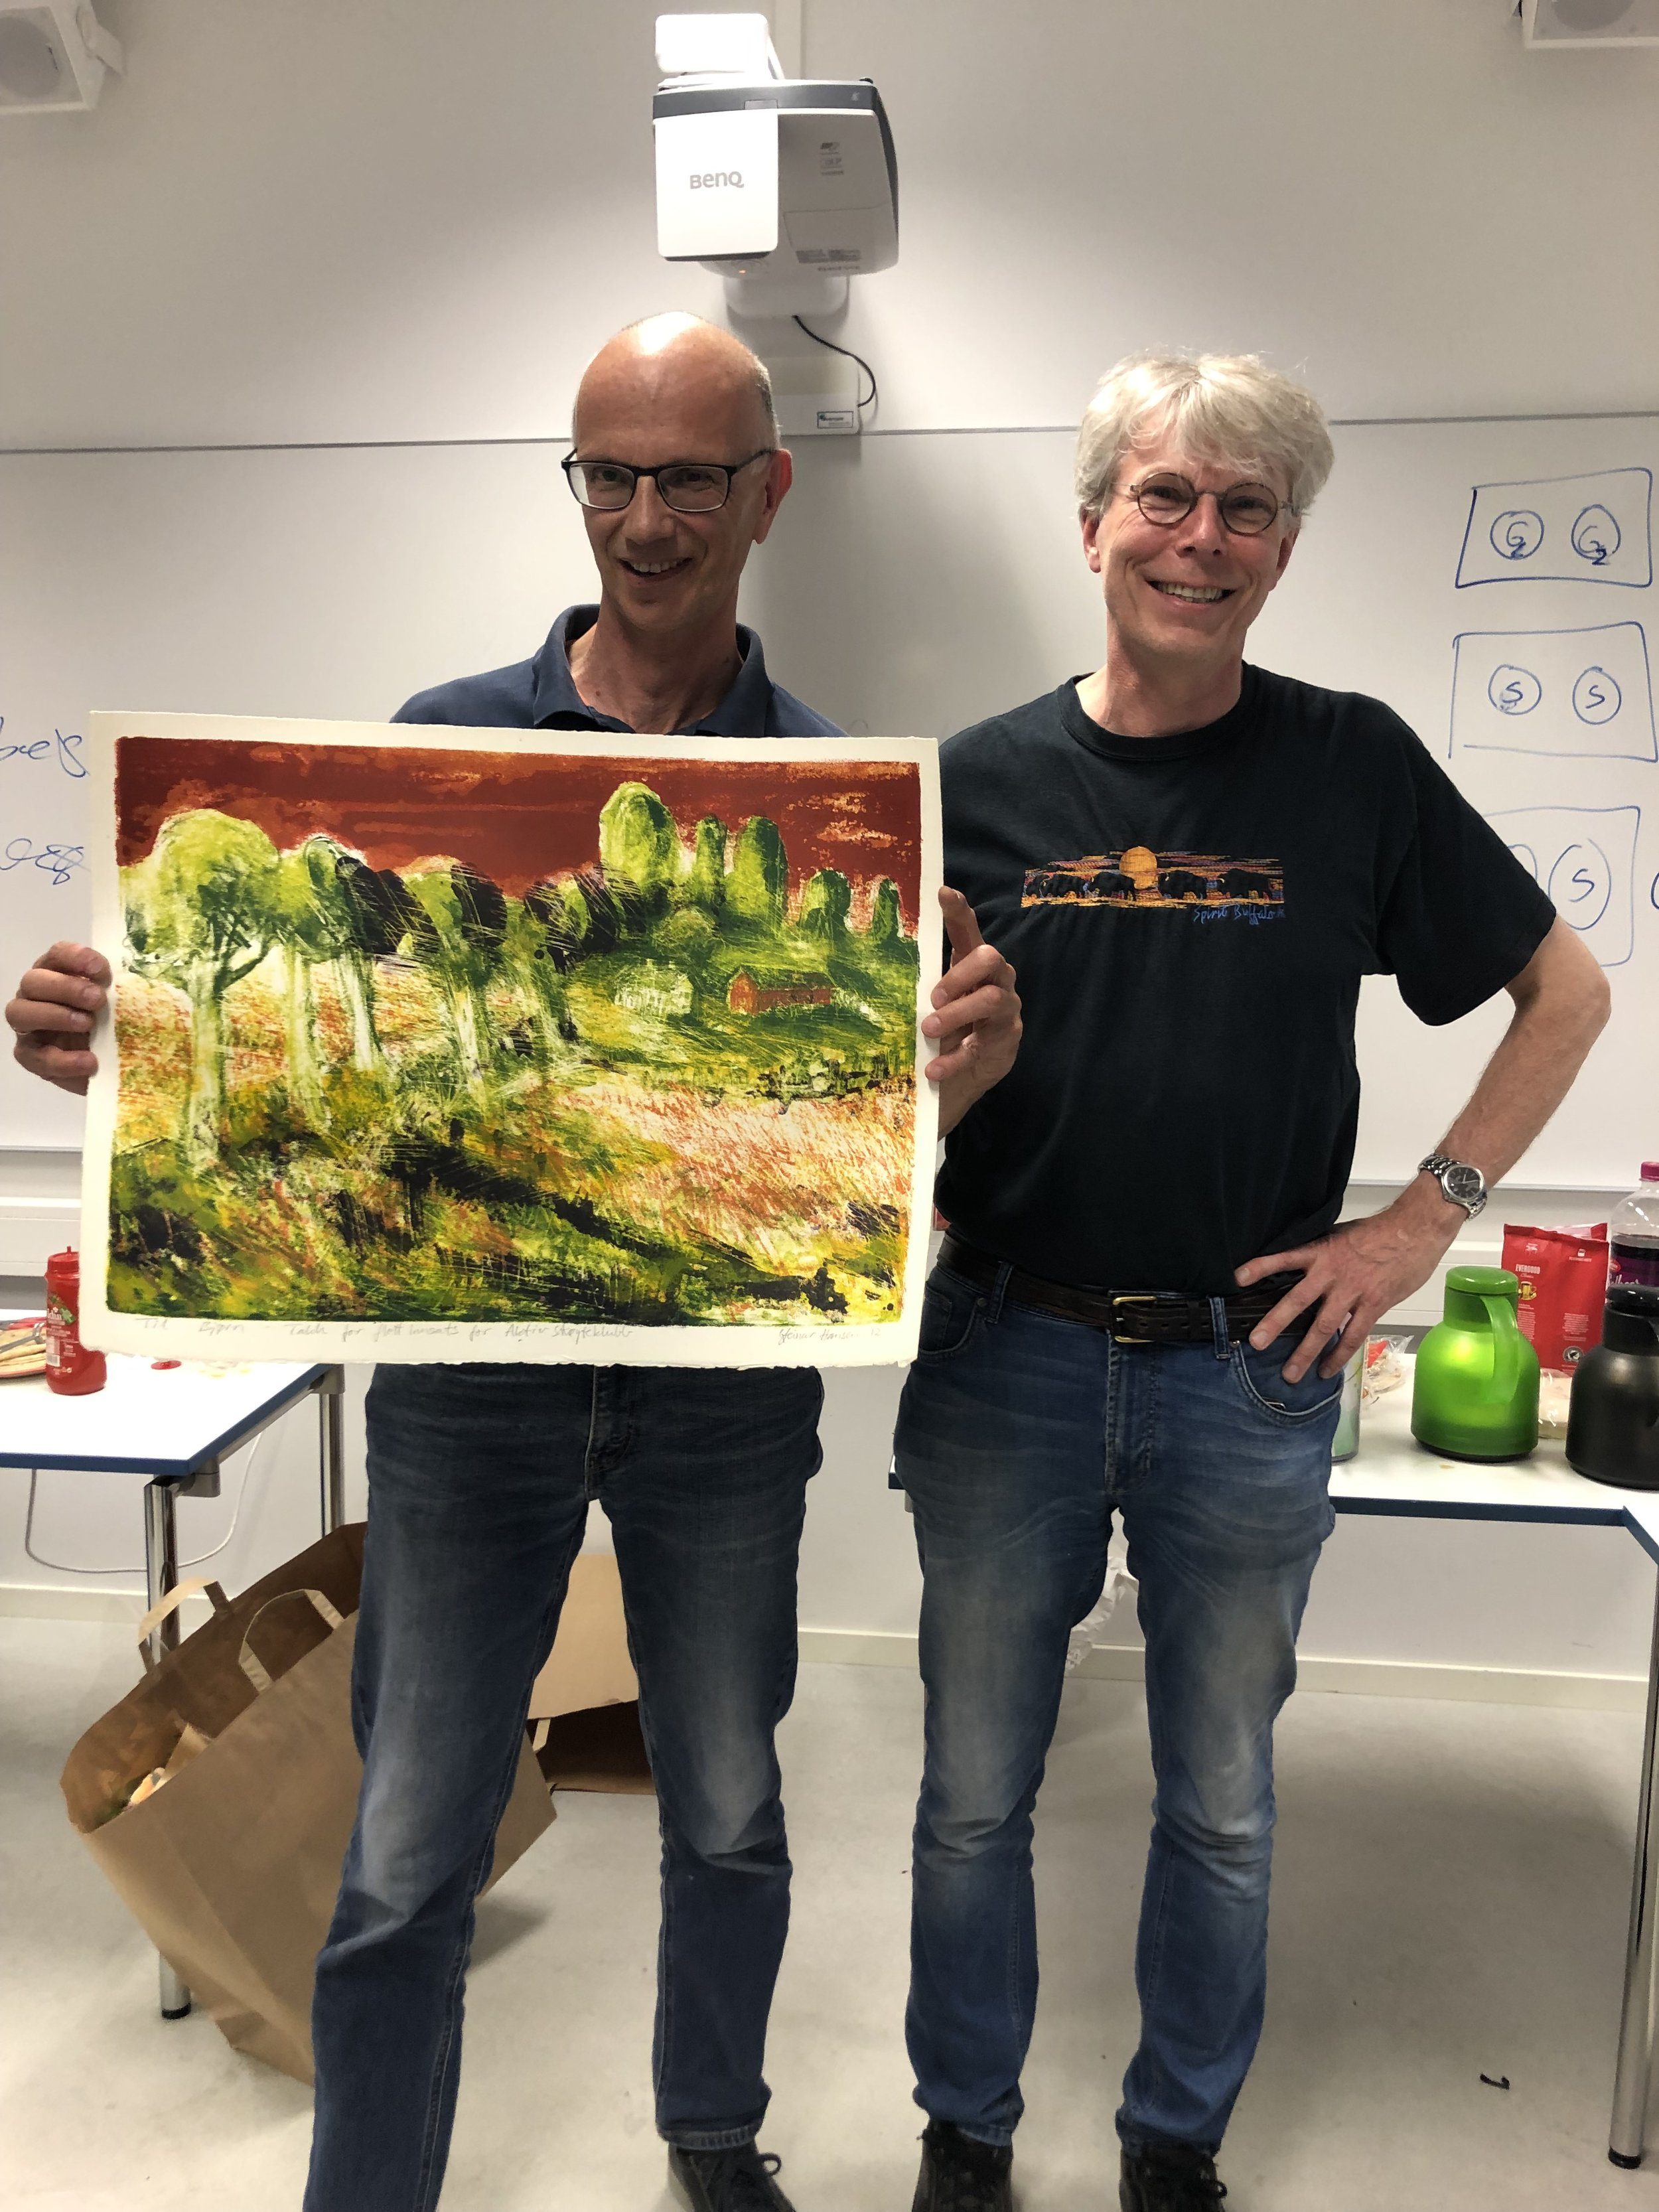 Bjørn Kroken og Snorre Kverndokk